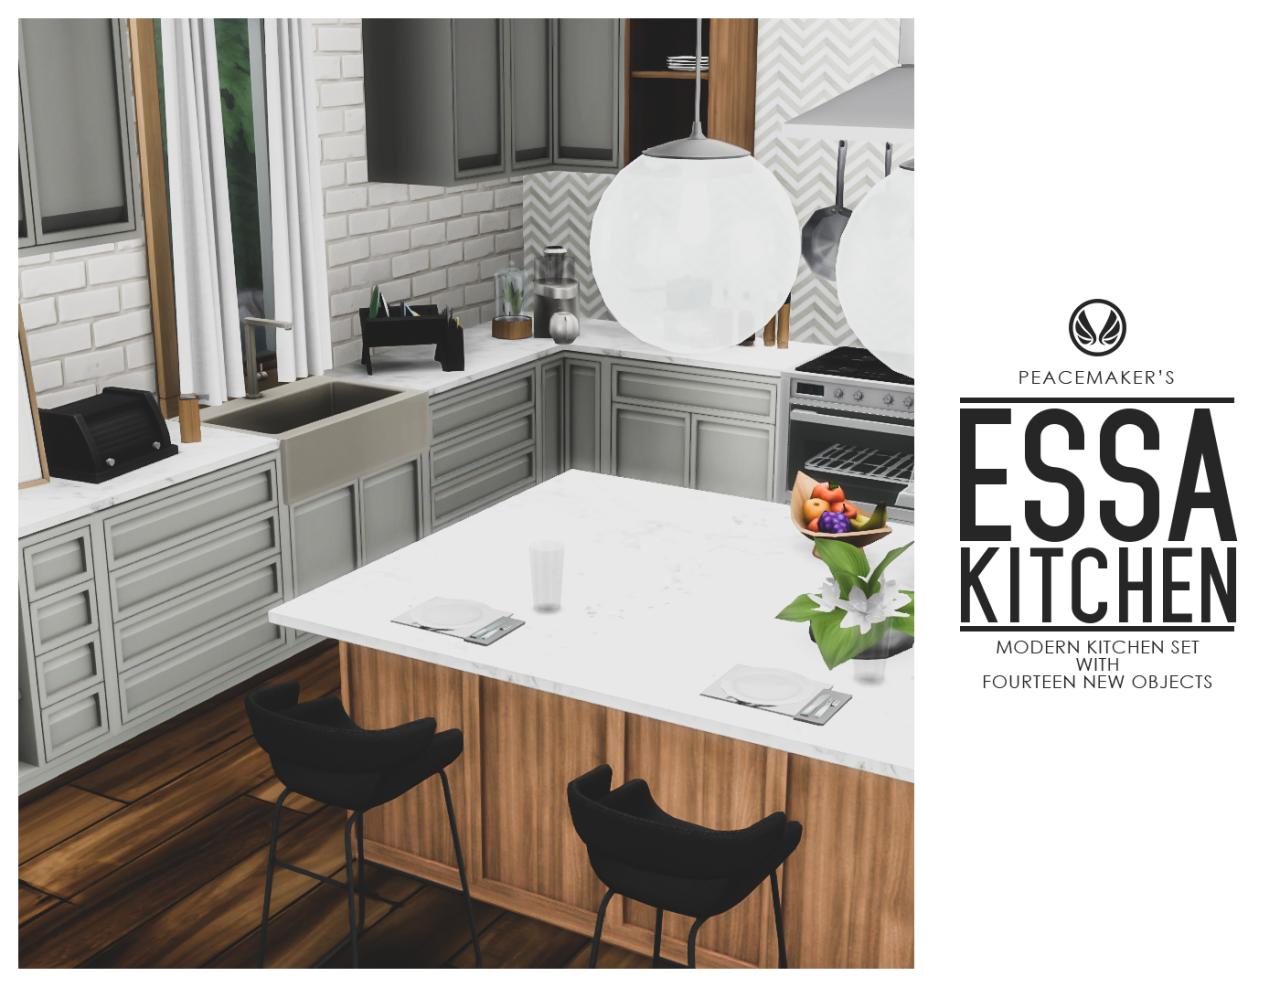 Source: Tumblr | Kitchen Set | Sims 4 | TS4 | Maxis Match ...